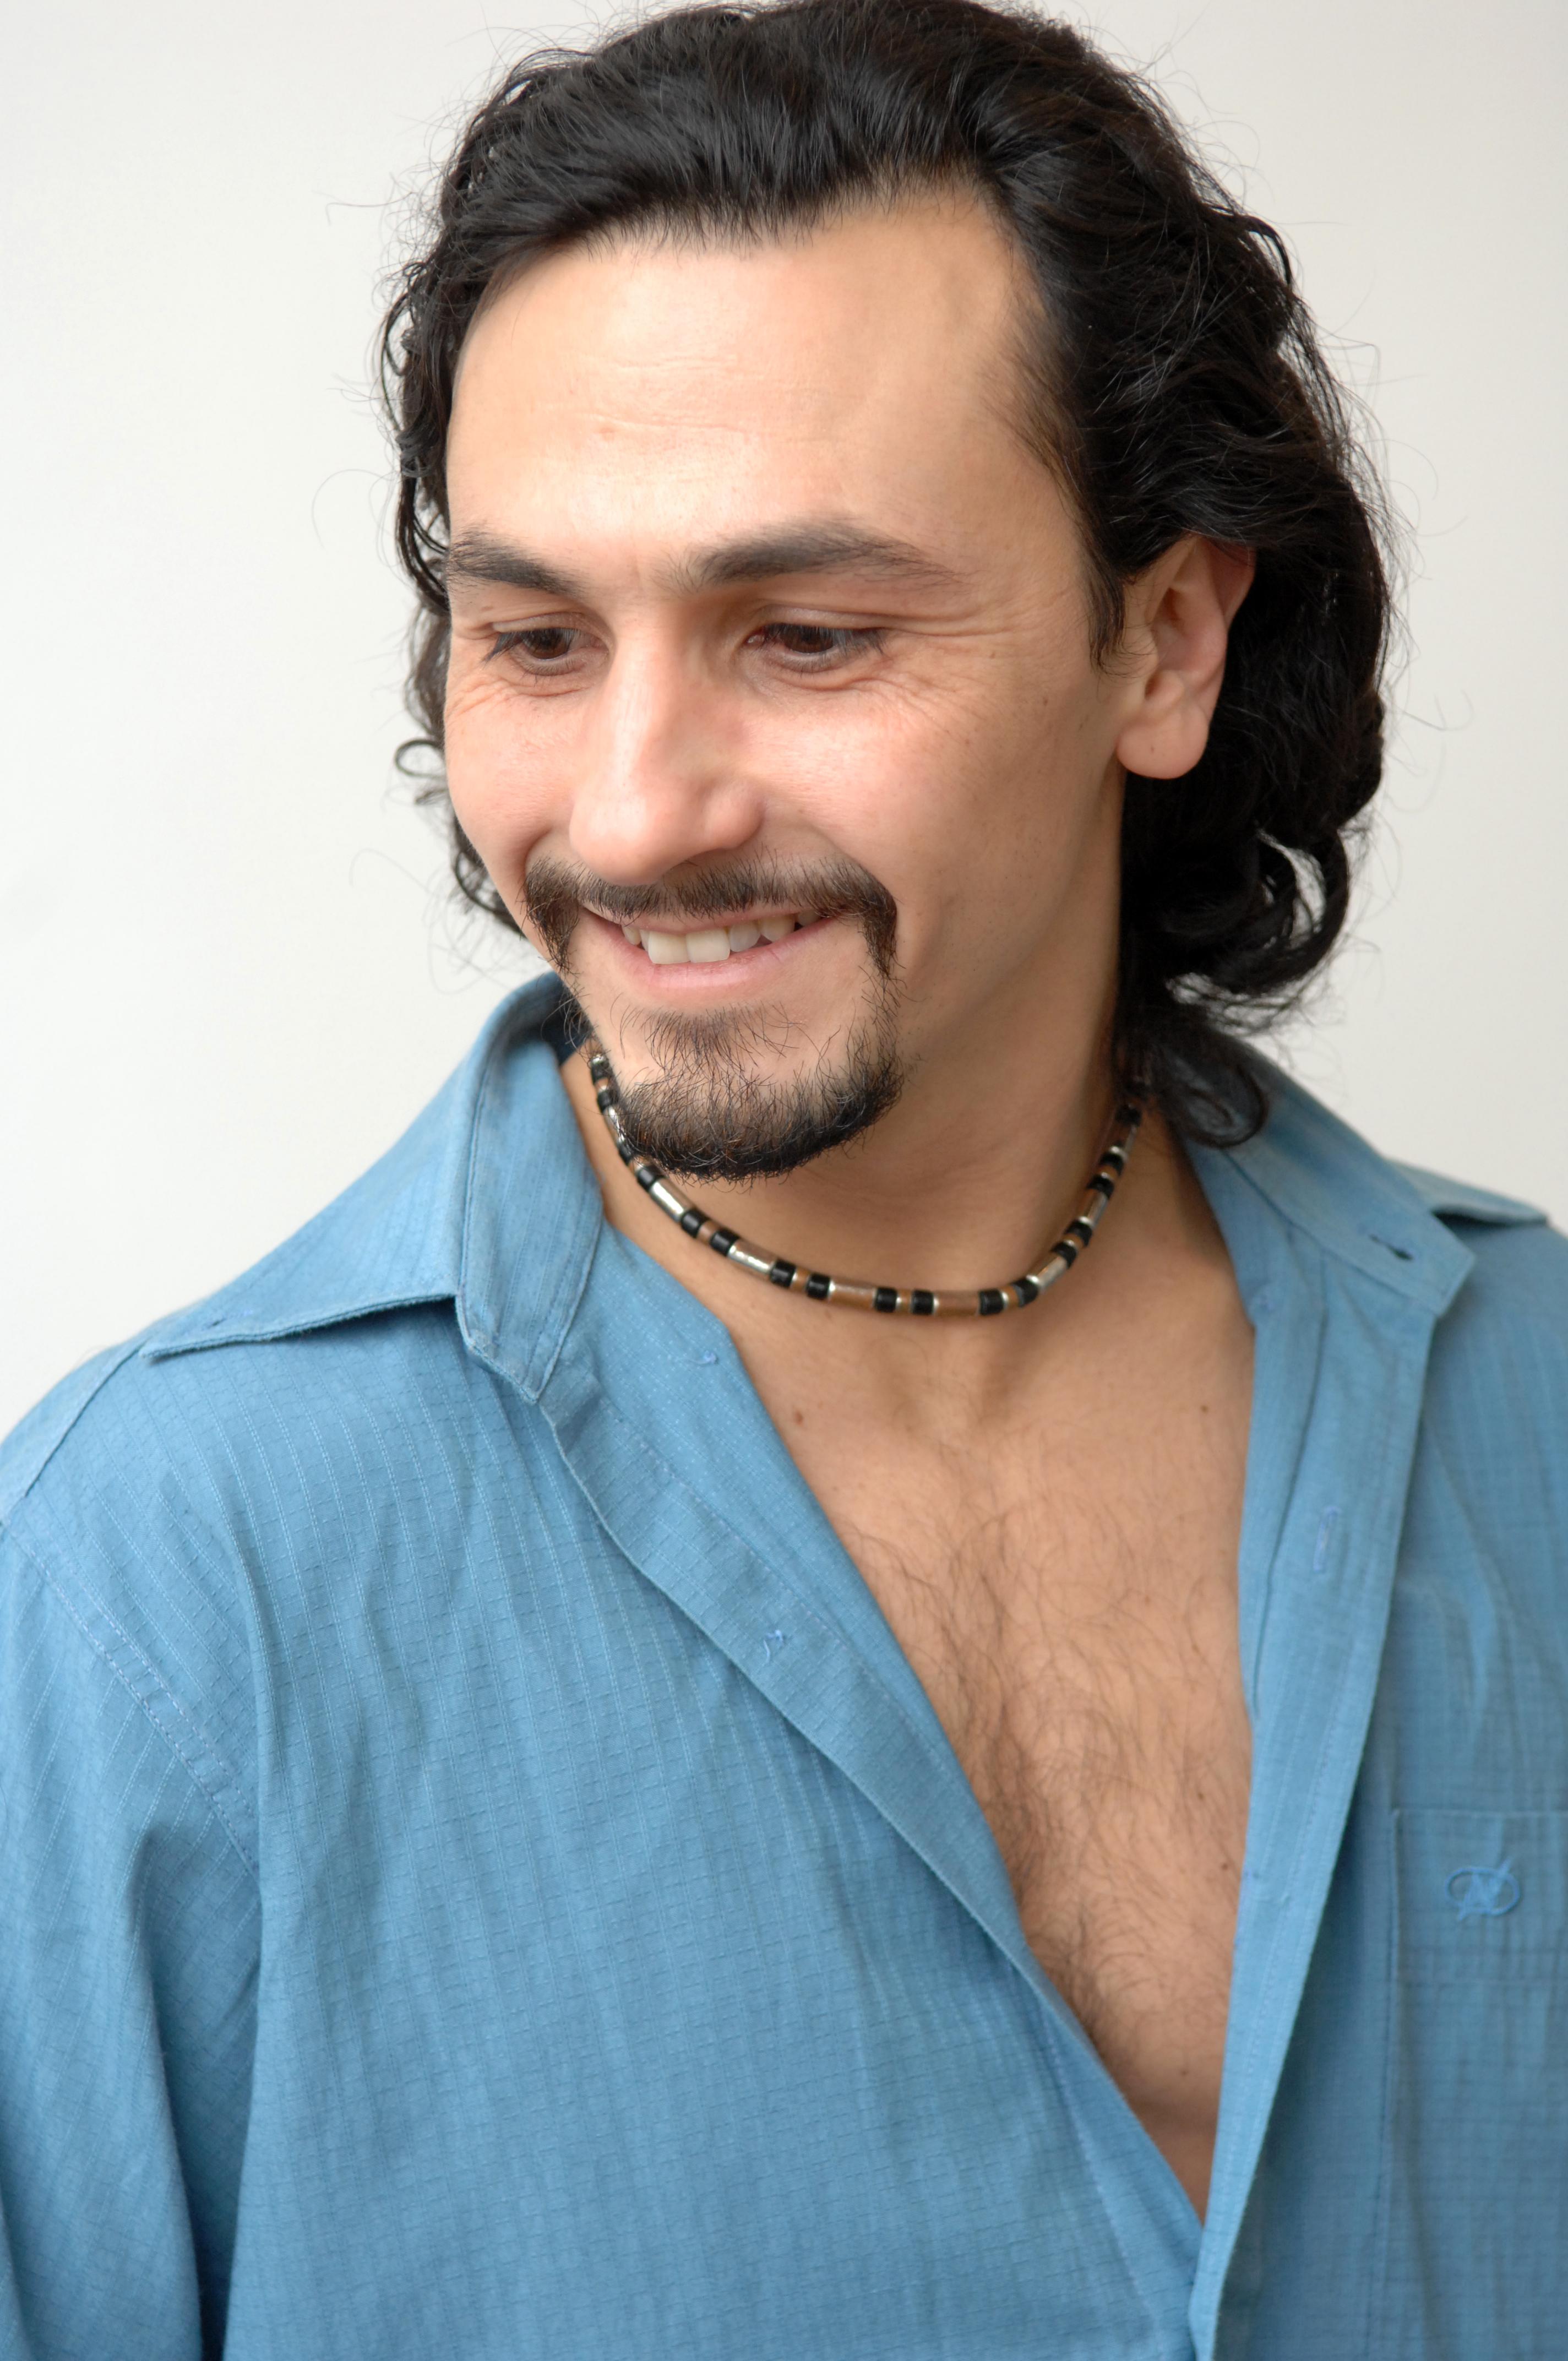 Ezequiel Sanucci